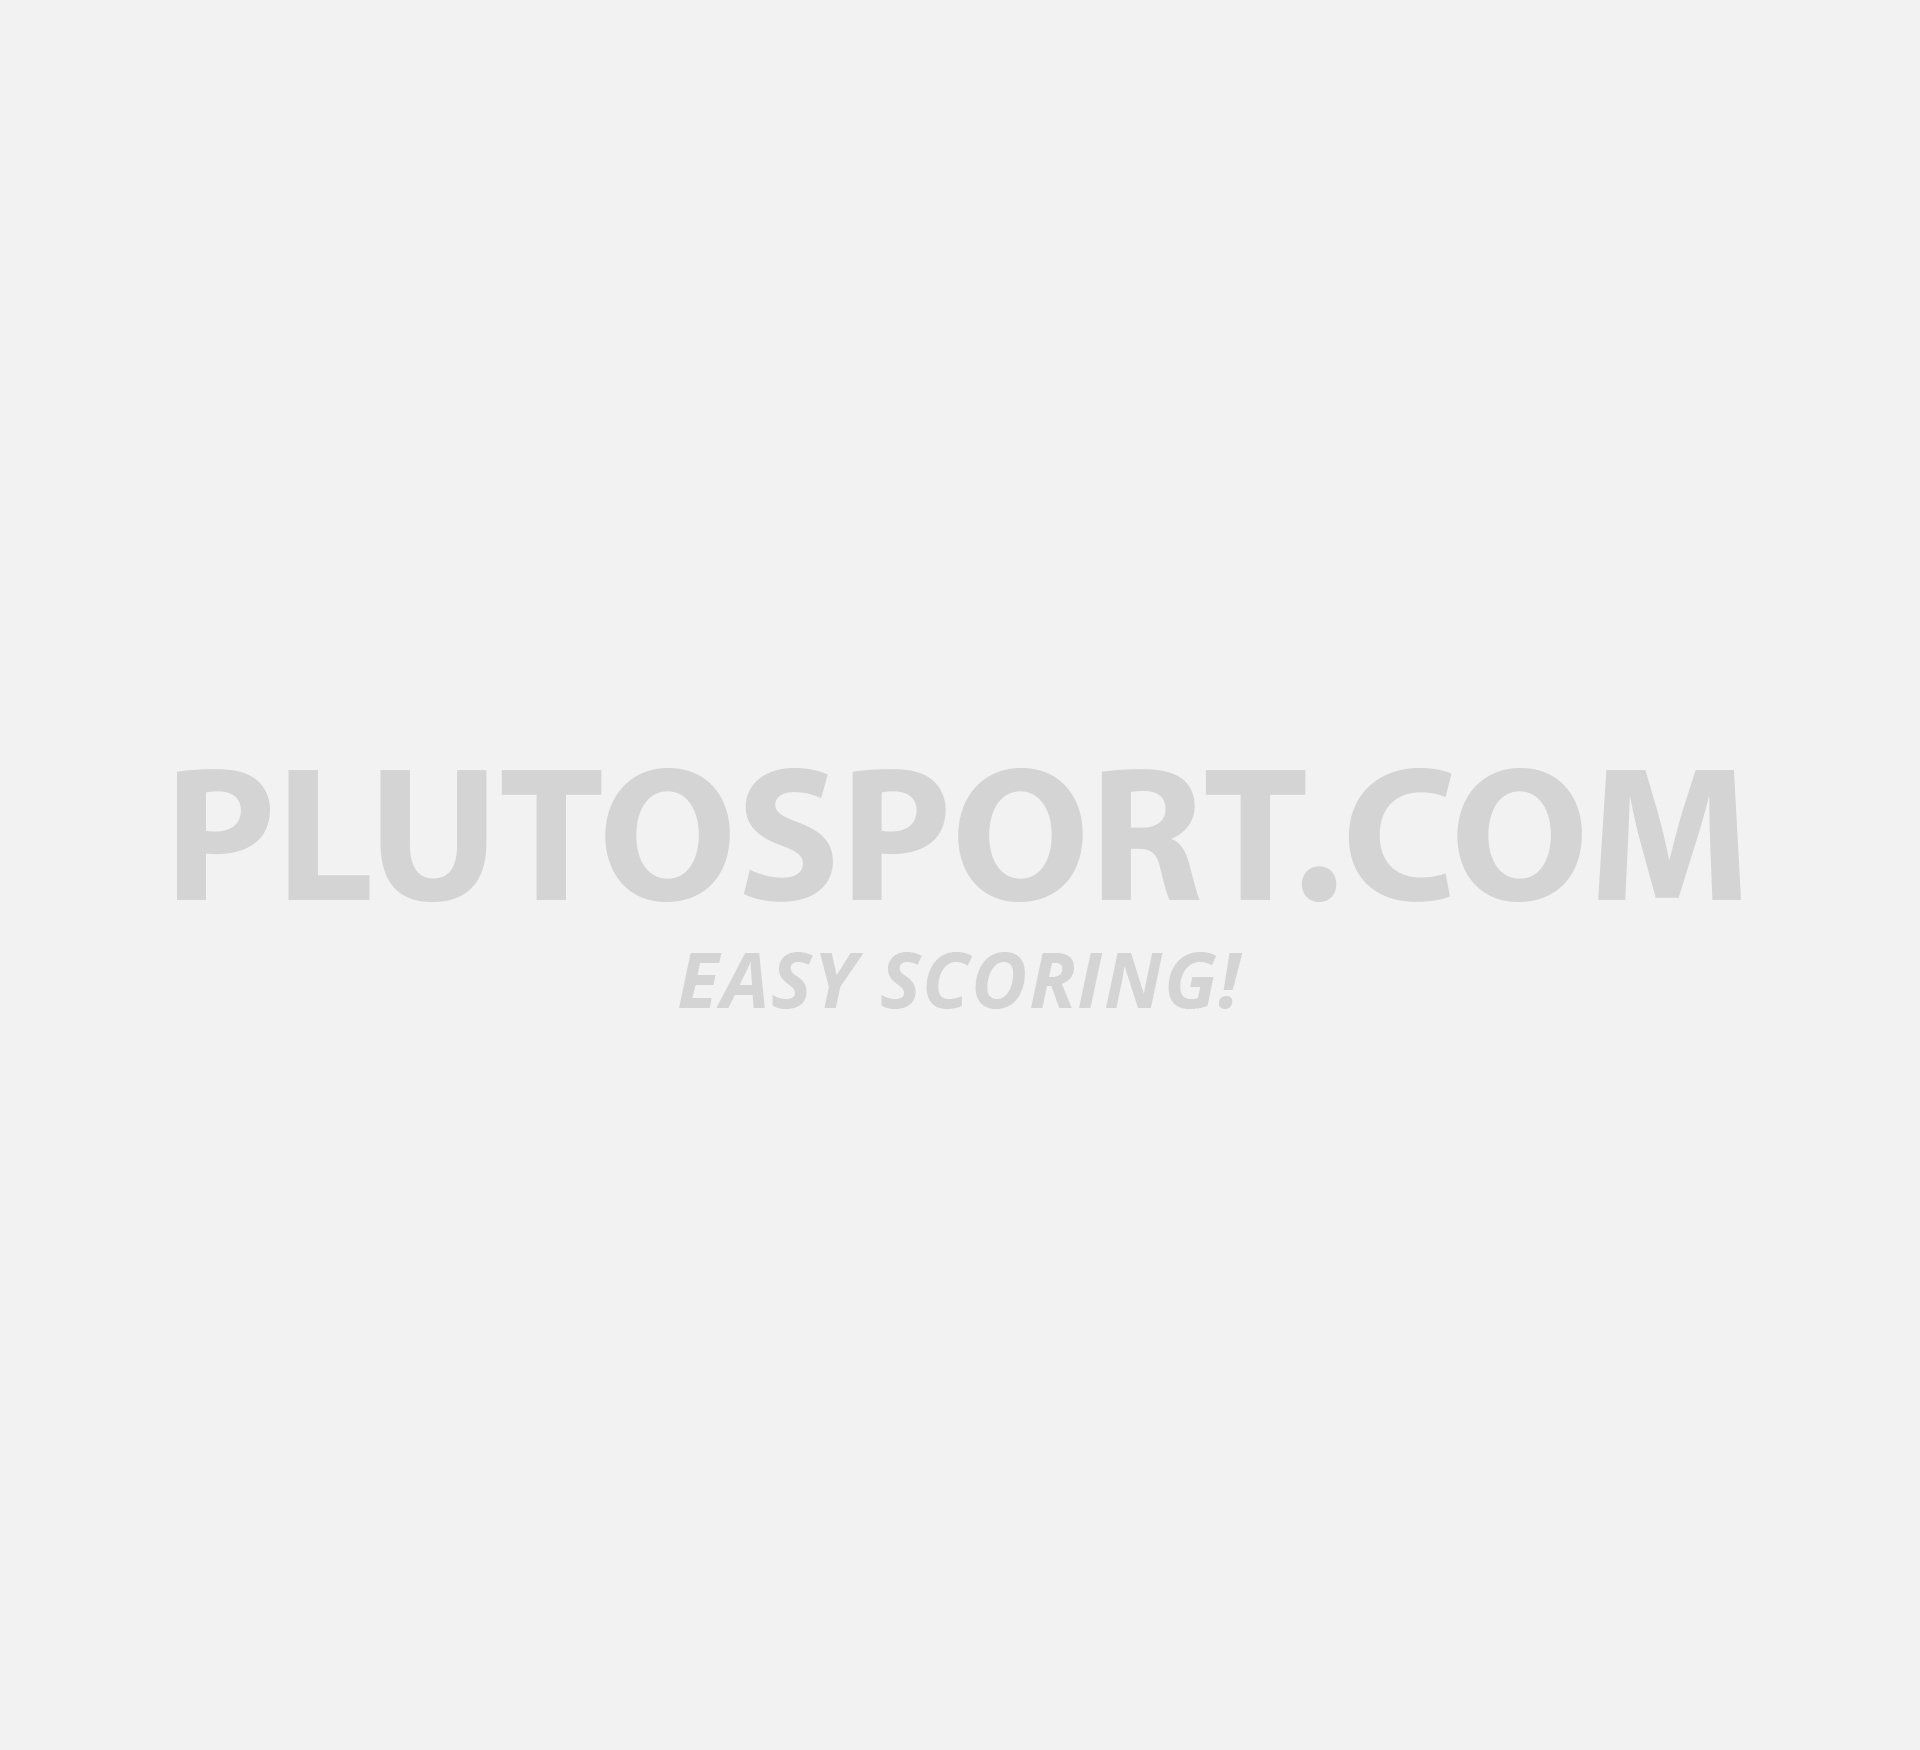 df08dabdea39 Adidas adiZero Rose 1.5 Basketballshoe Men s - Shoes - Basketball ...